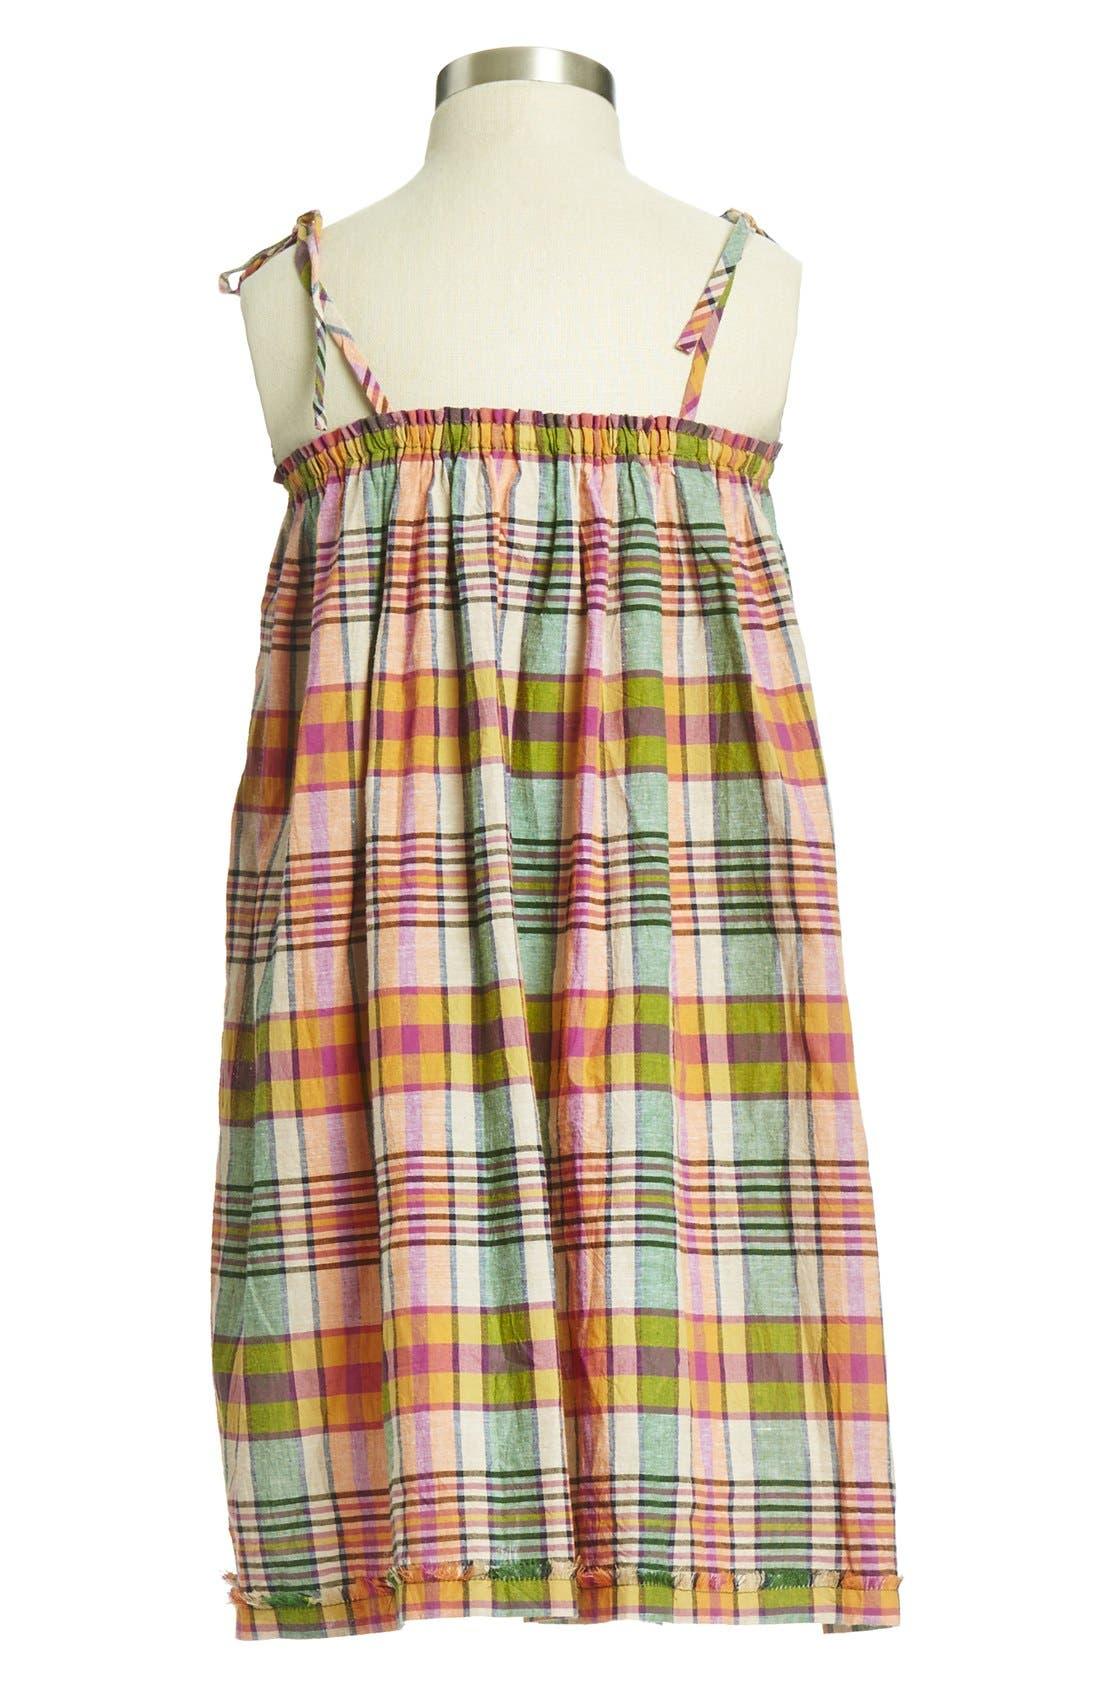 Alternate Image 2  - Peek 'Collette' Plaid Cotton Dress (Toddler Girls, Little Girls & Big Girls)